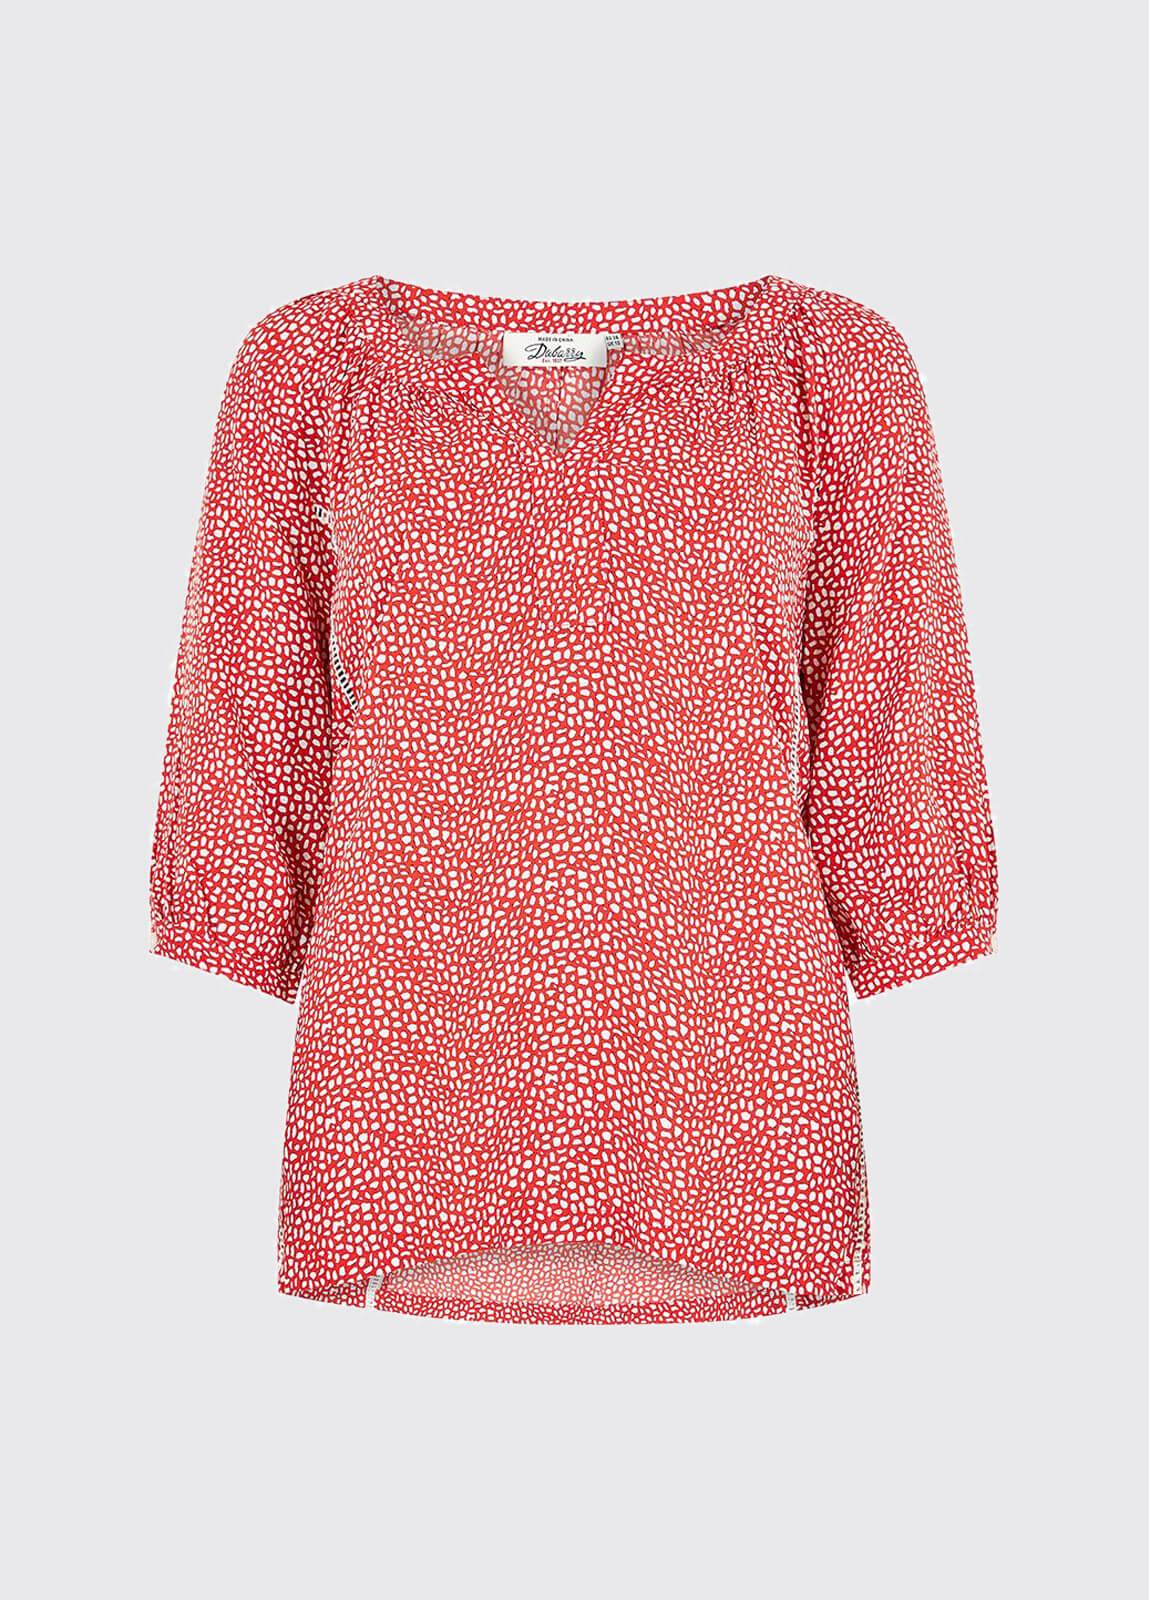 Dahlia Shirt - Poppy